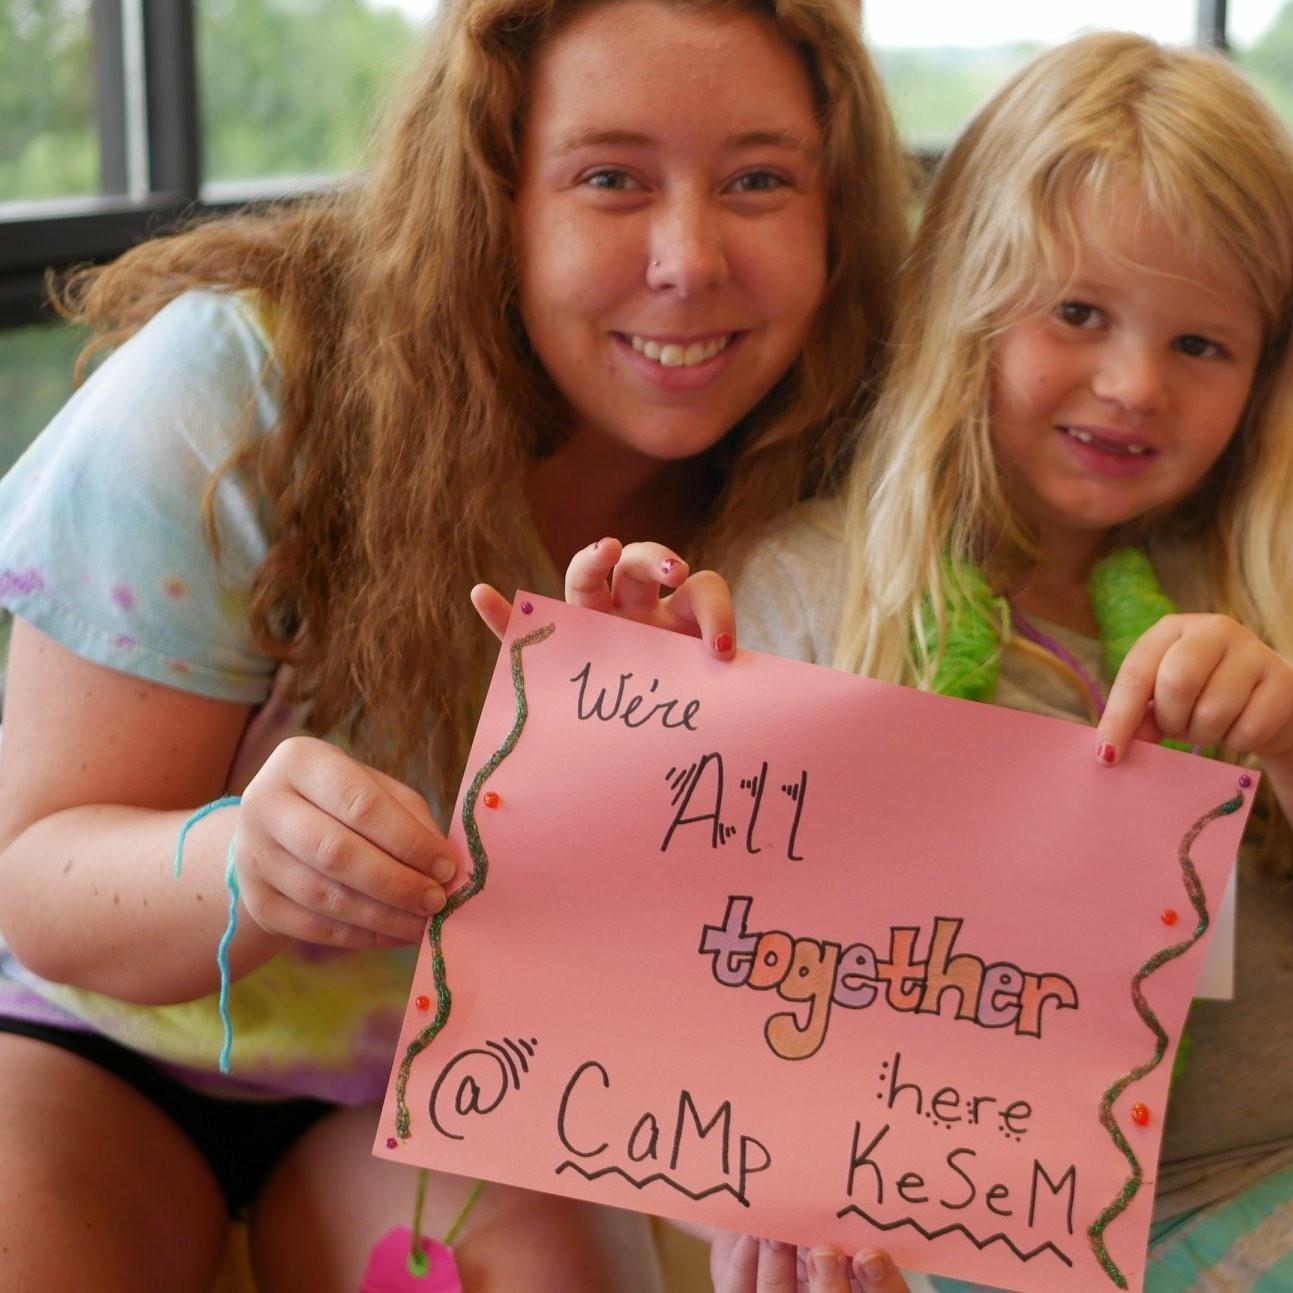 Camp Kesem at University of Kentucky